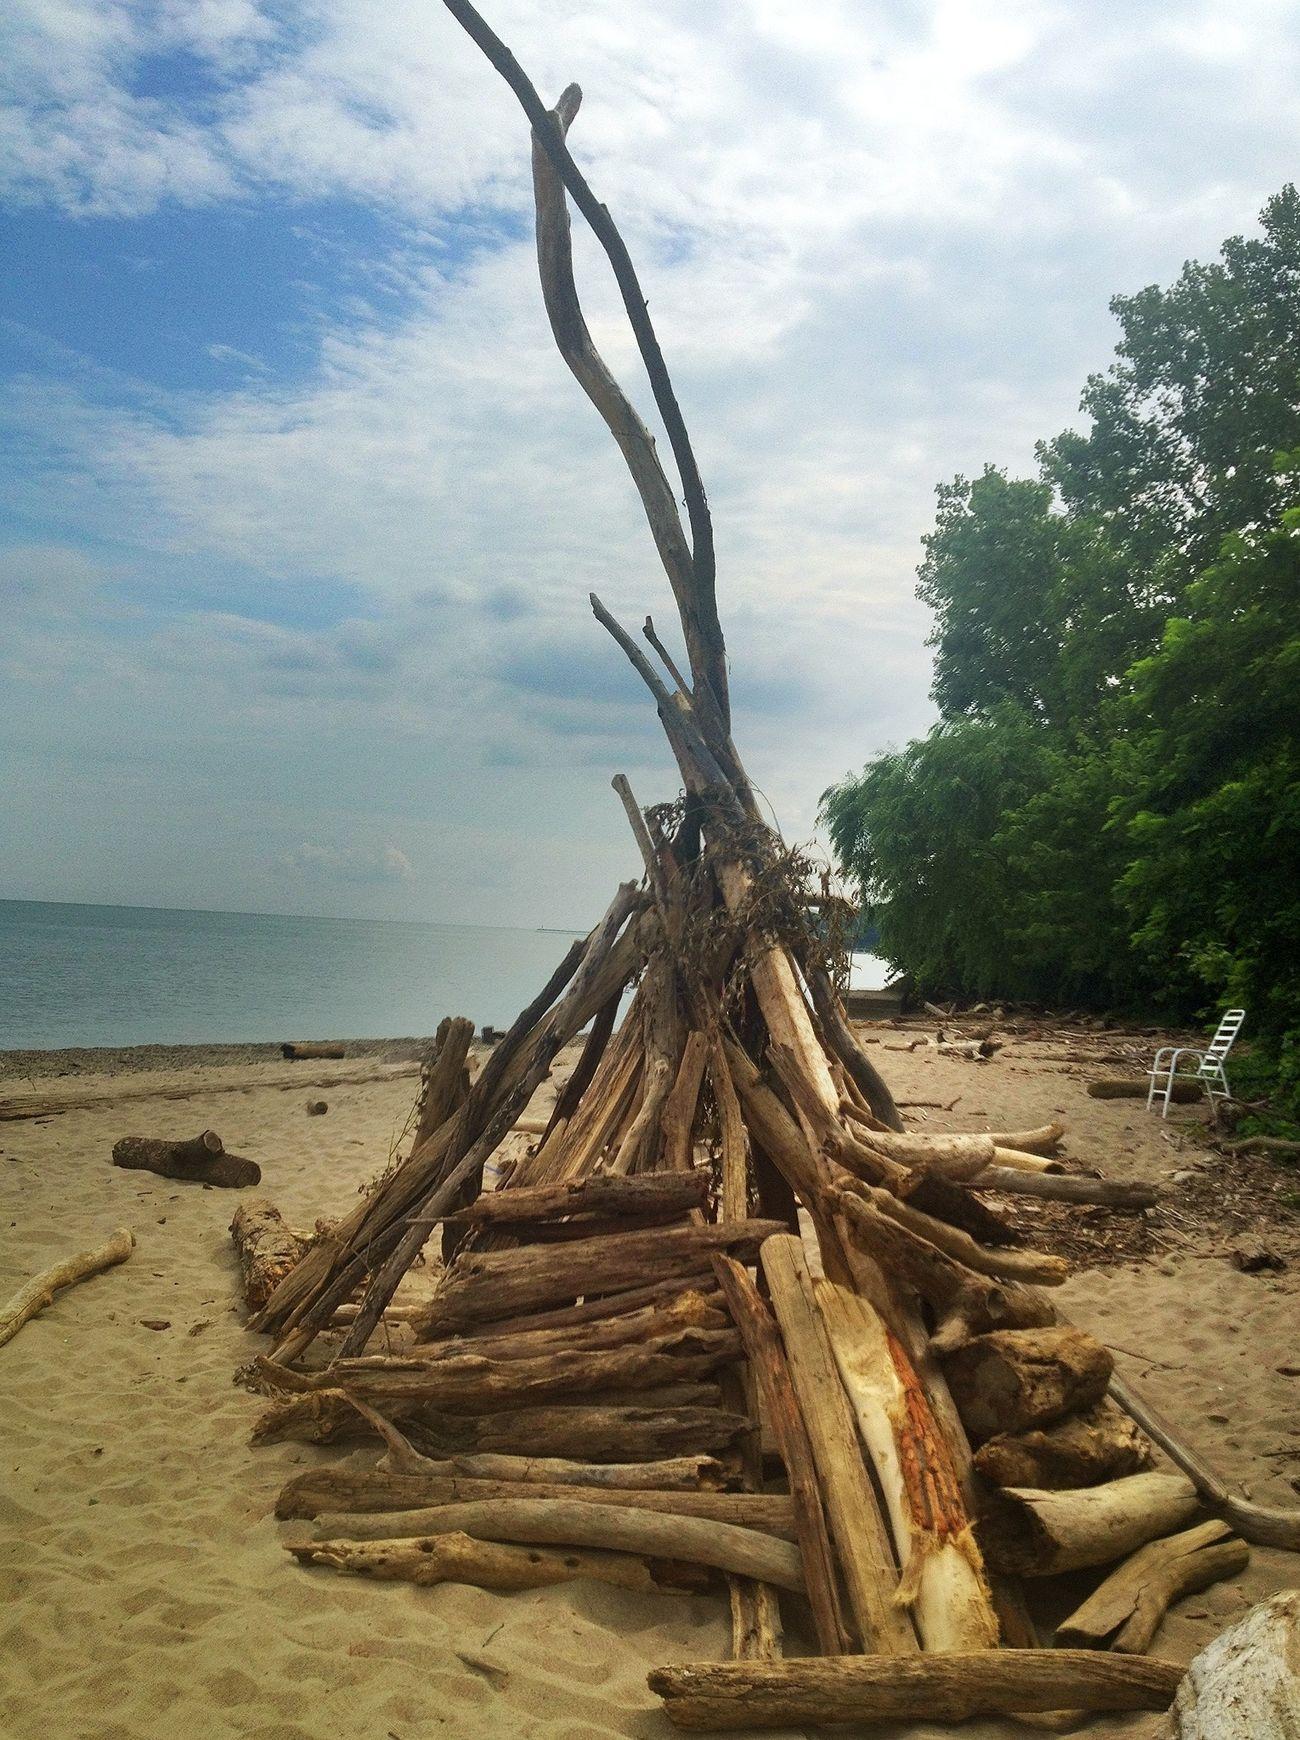 Art on the beach on Lake Erie